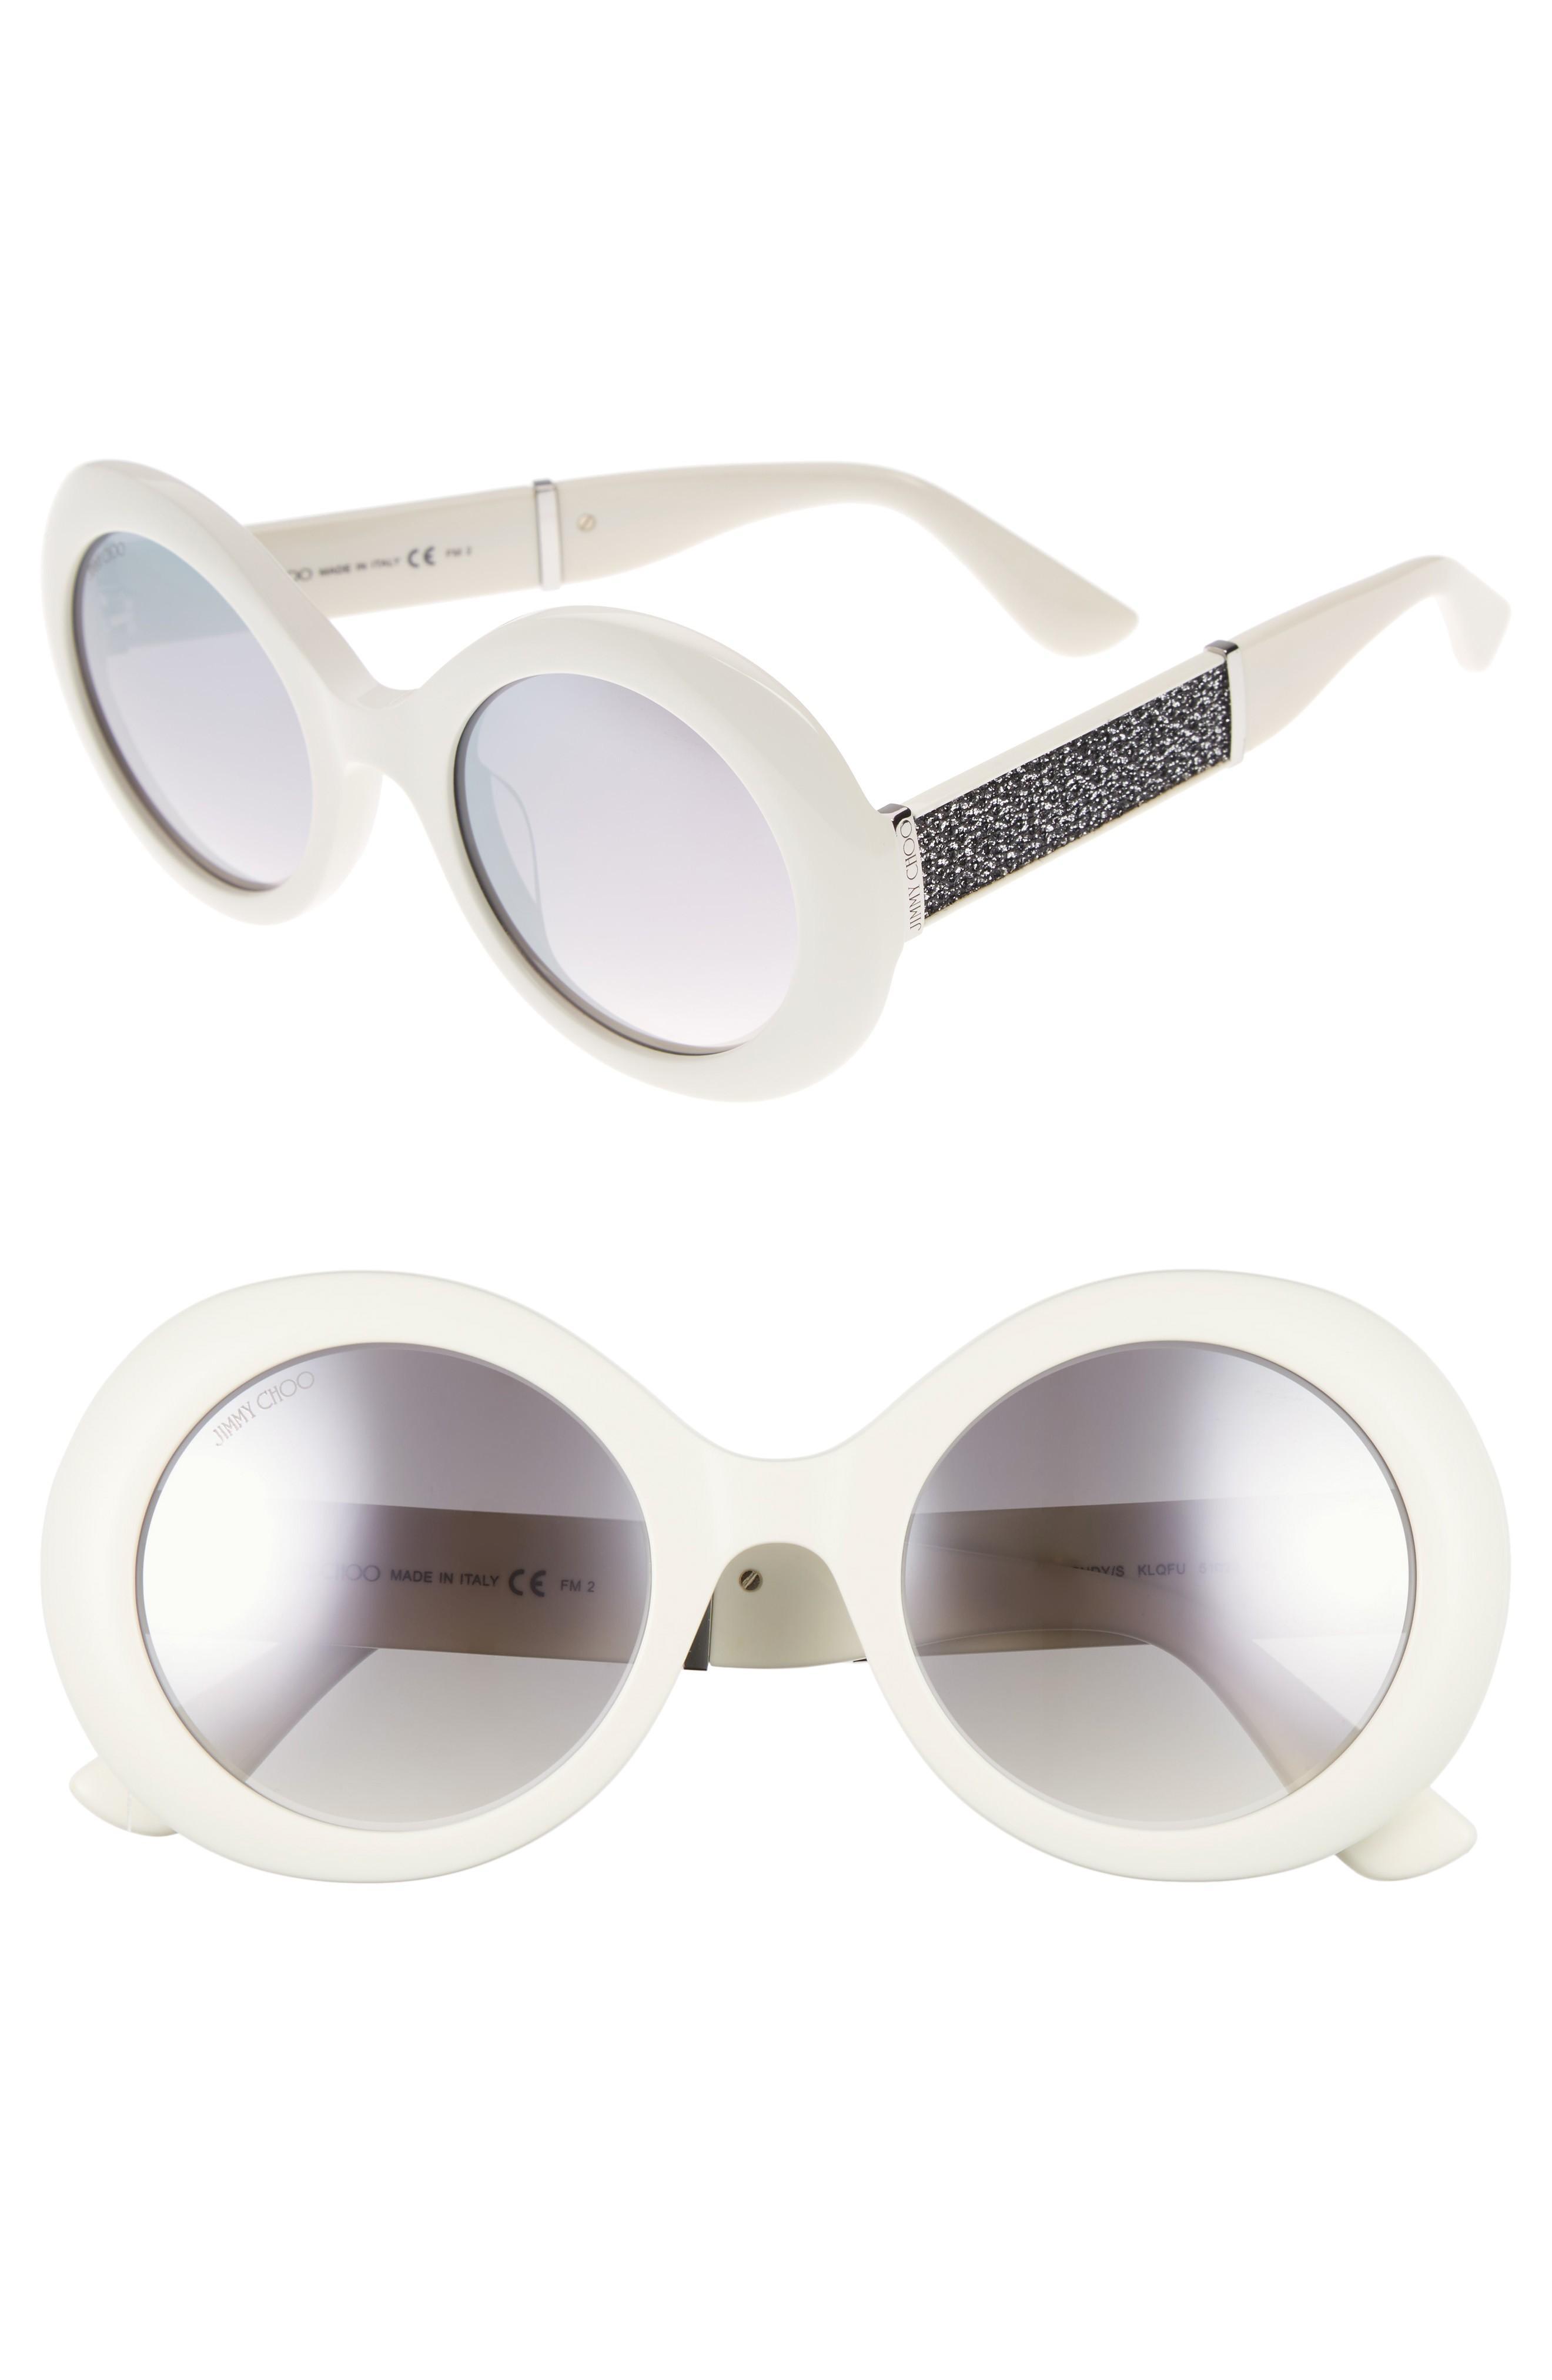 1aa451849c44 Jimmy Choo Wendy 51Mm Round Sunglasses - White/ Glitter/ White ...